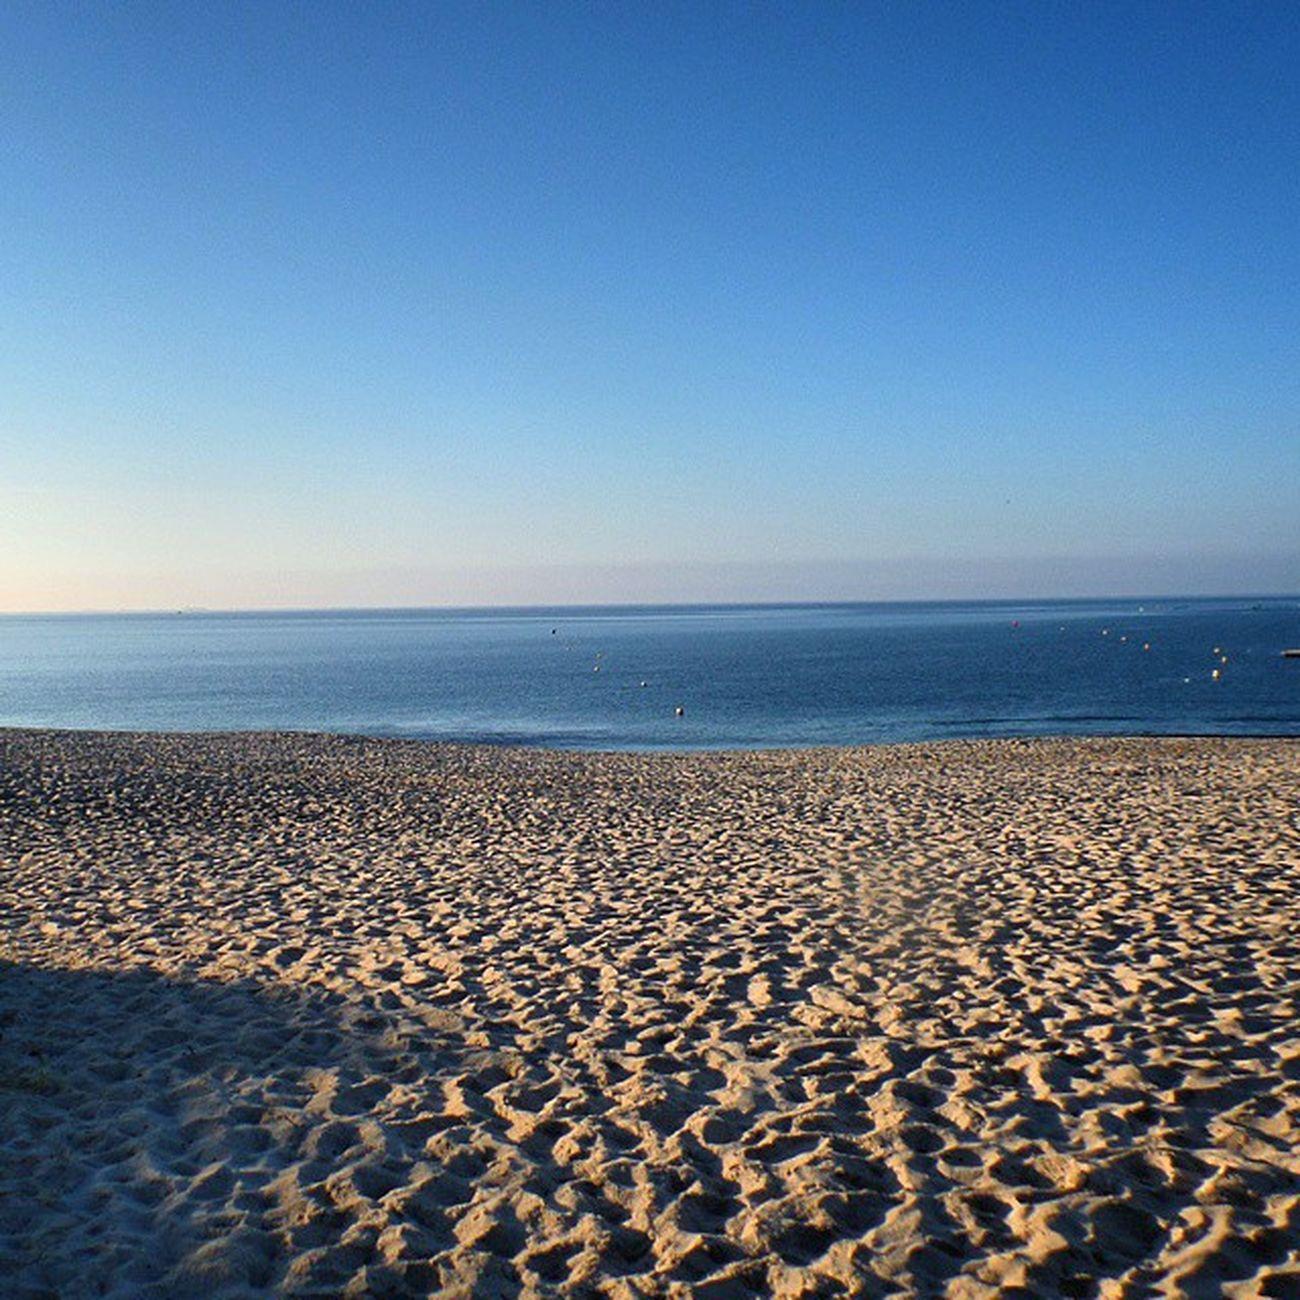 Plage Beach Santemarine Combrit bretagneholidaysseasandhorizoncoolyololikeperfect